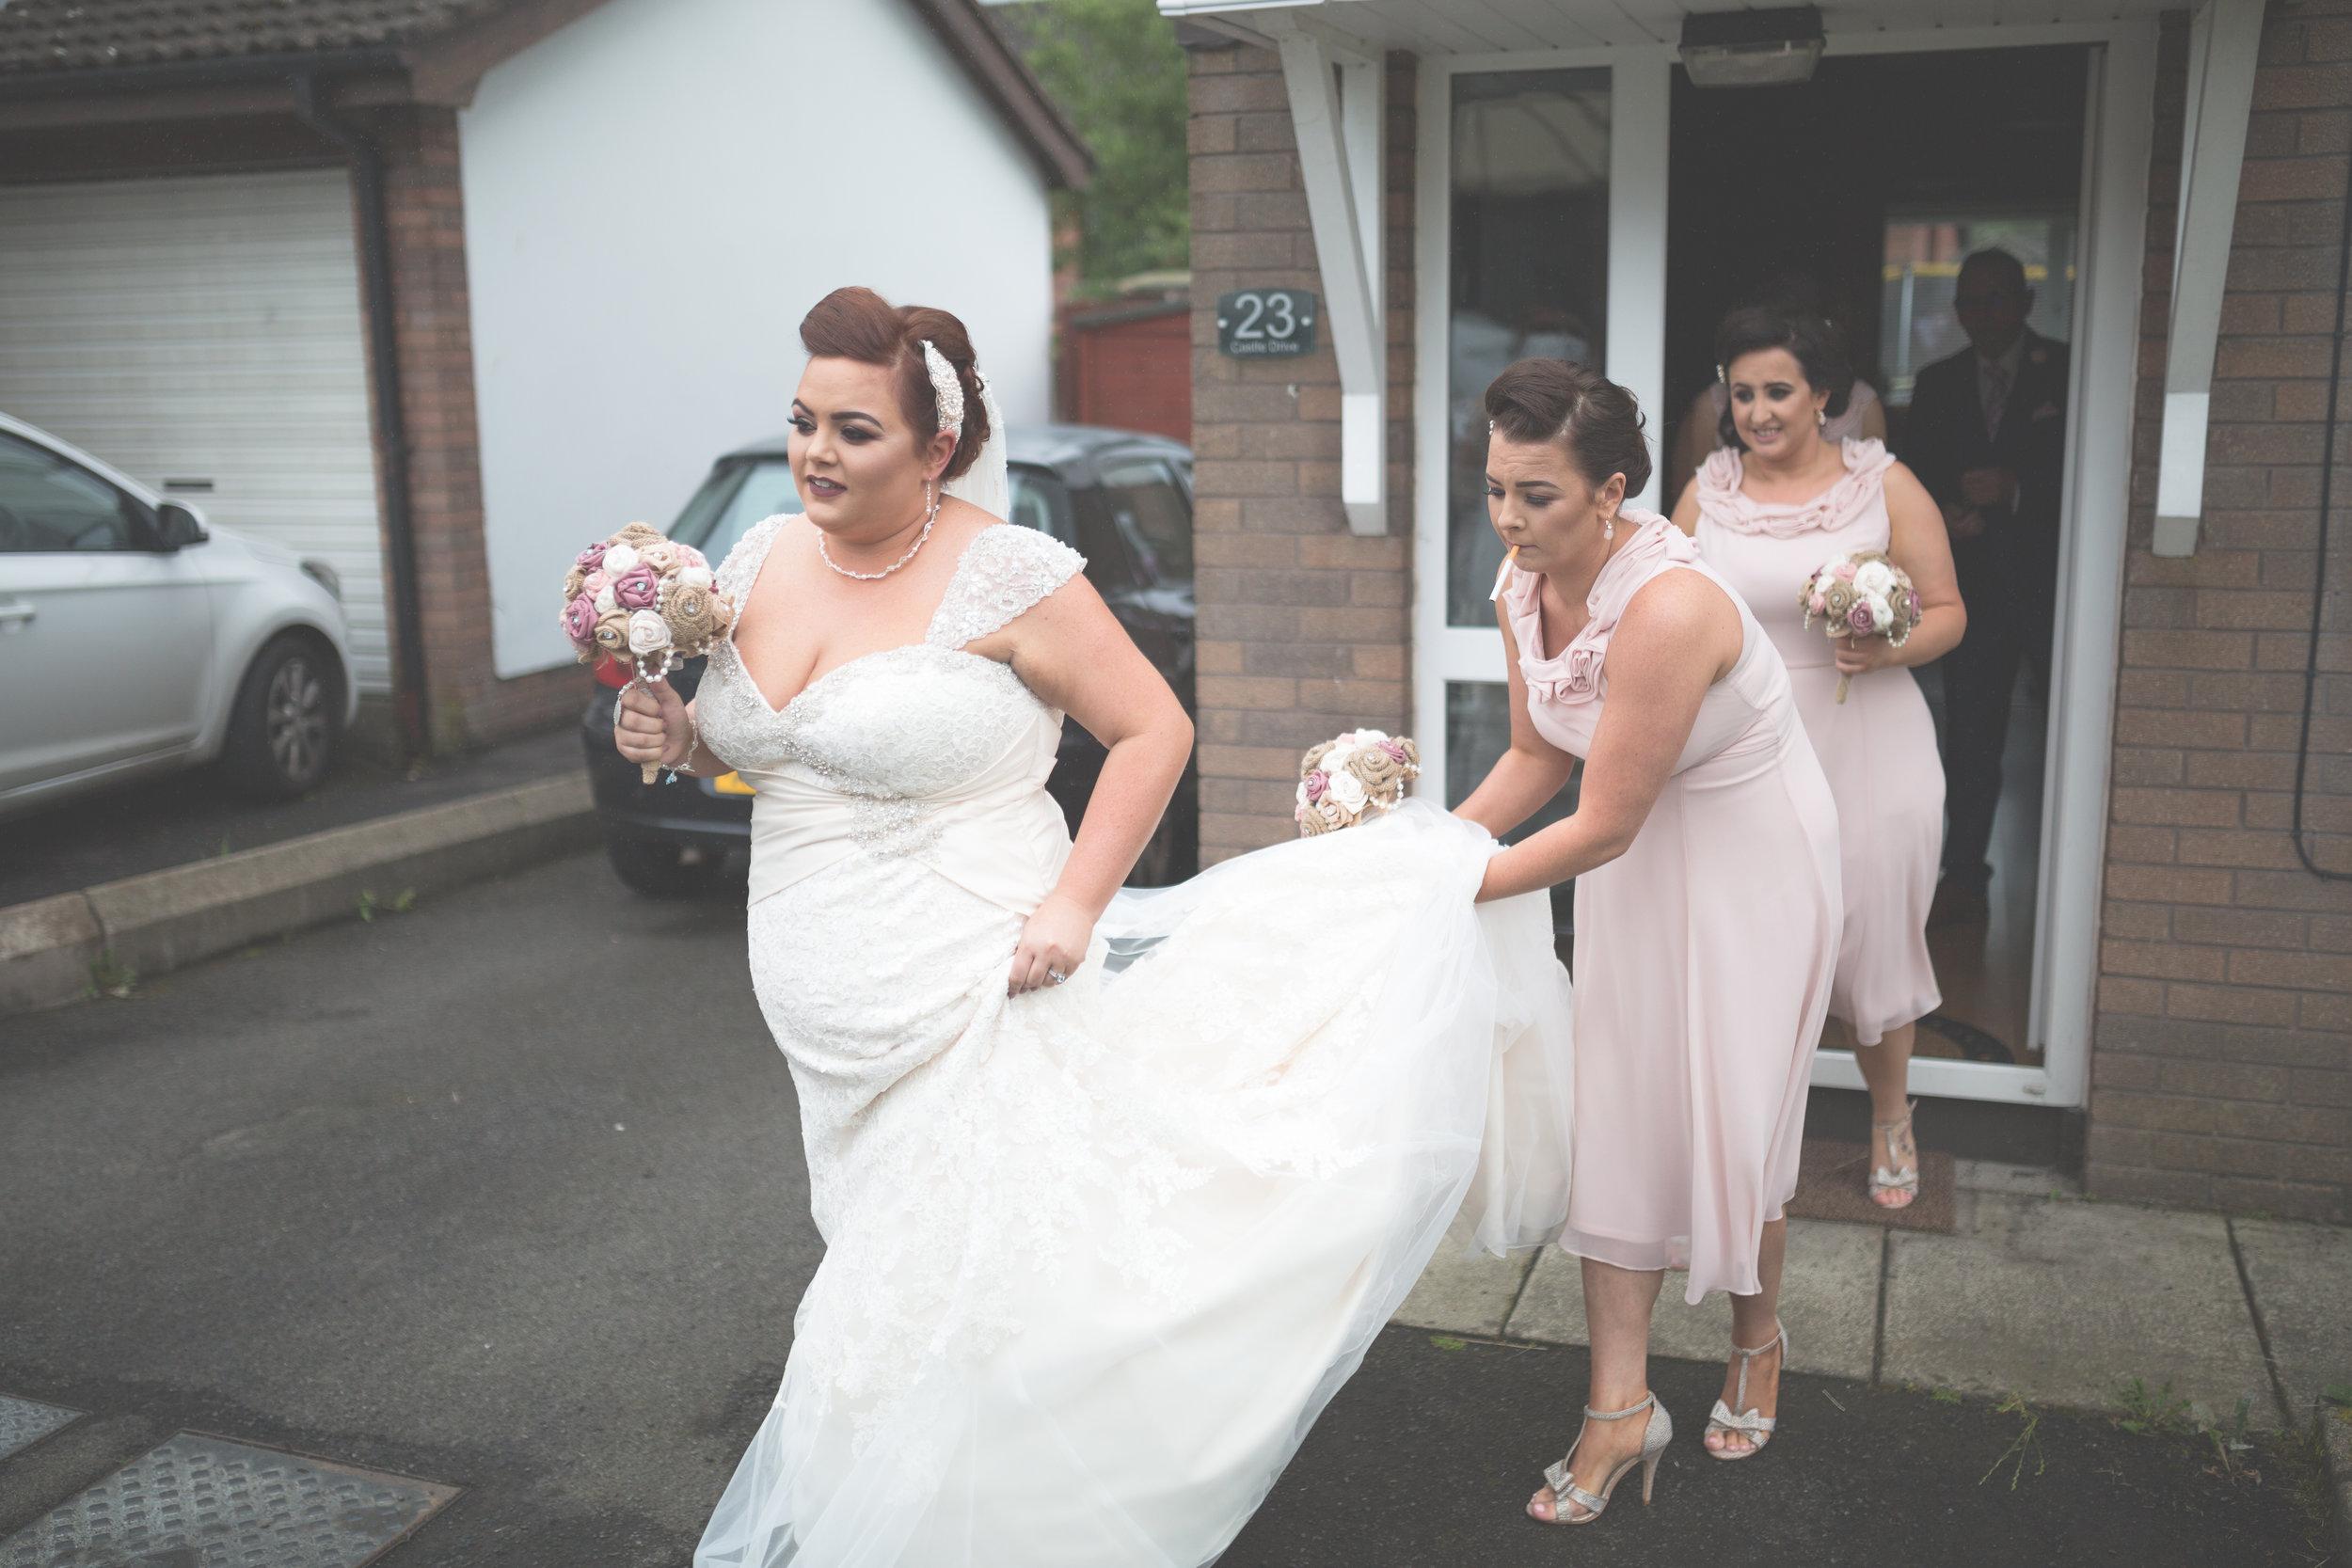 Antoinette & Stephen - Bridal Preparations | Brian McEwan Photography | Wedding Photographer Northern Ireland 192.jpg